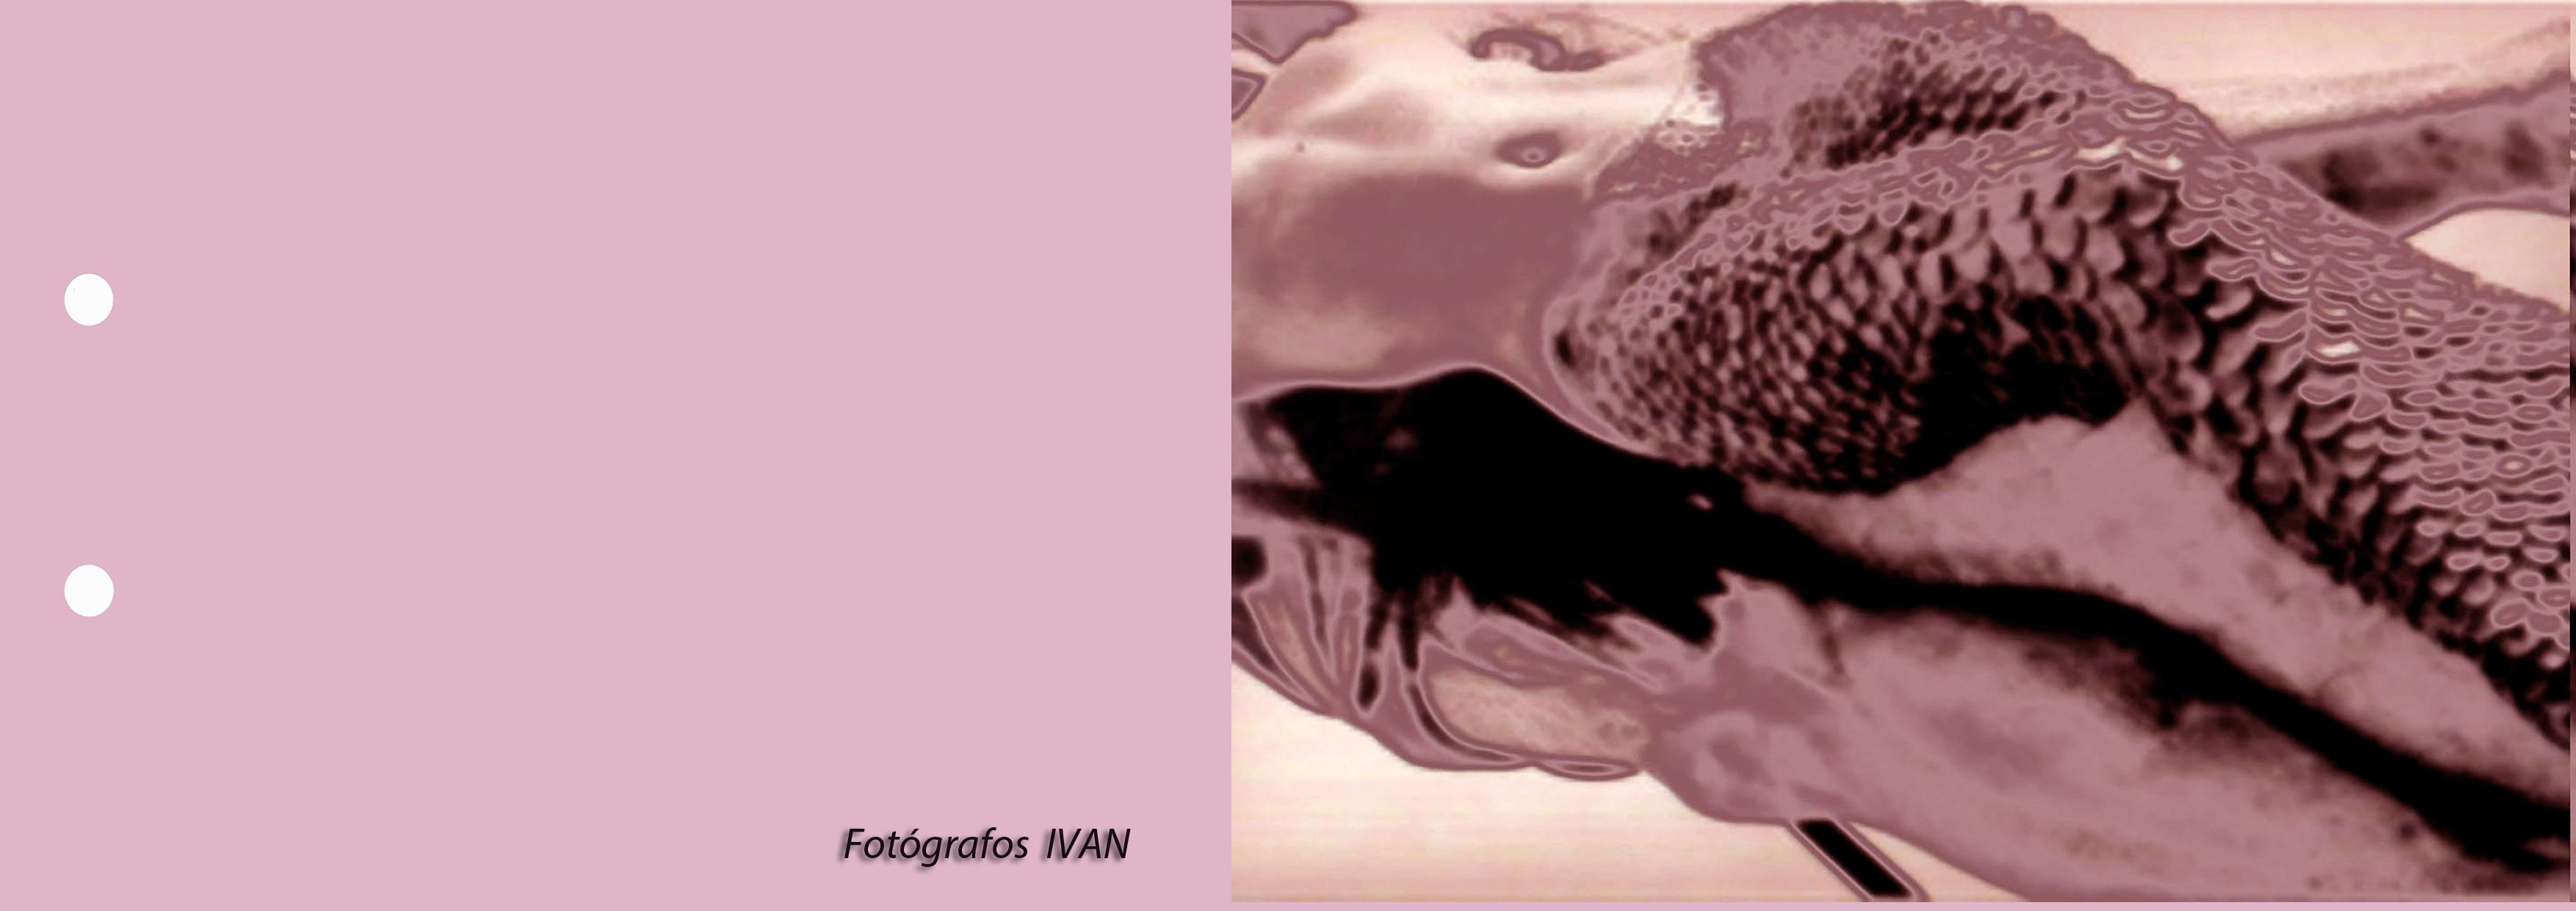 41-catalogo-IVAN-SIRENA.jpg